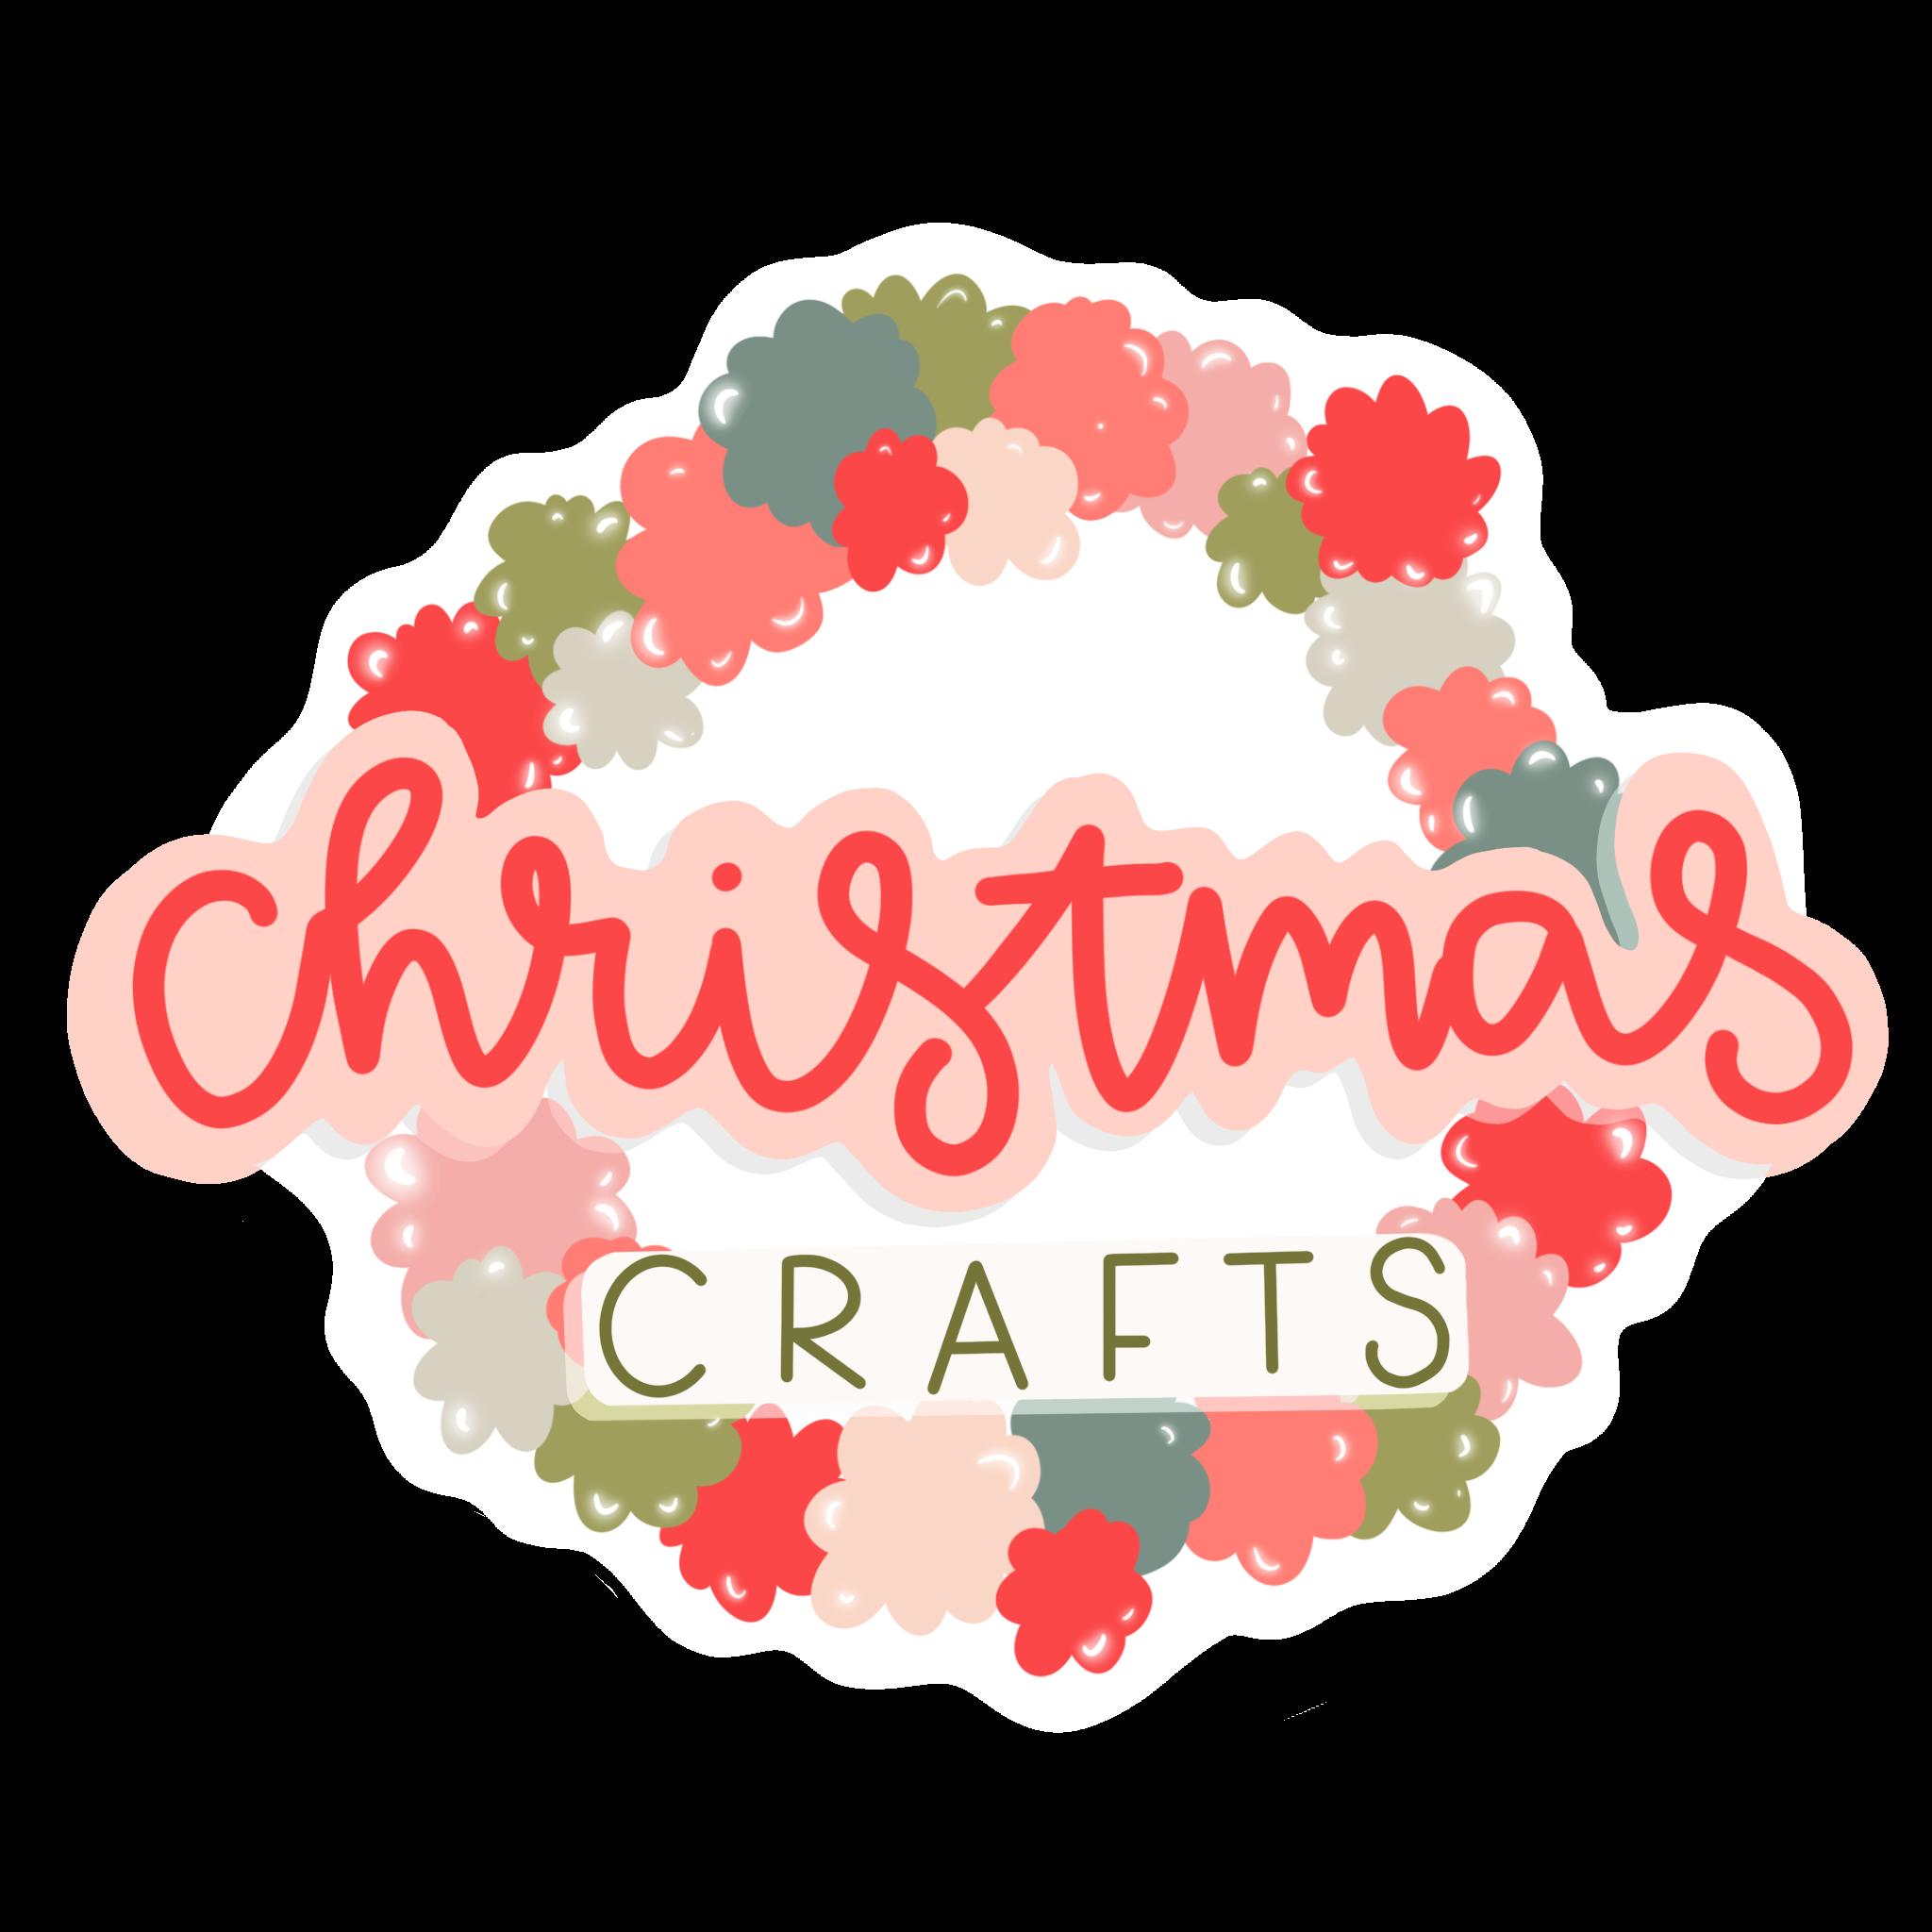 Christmas Crafts logo